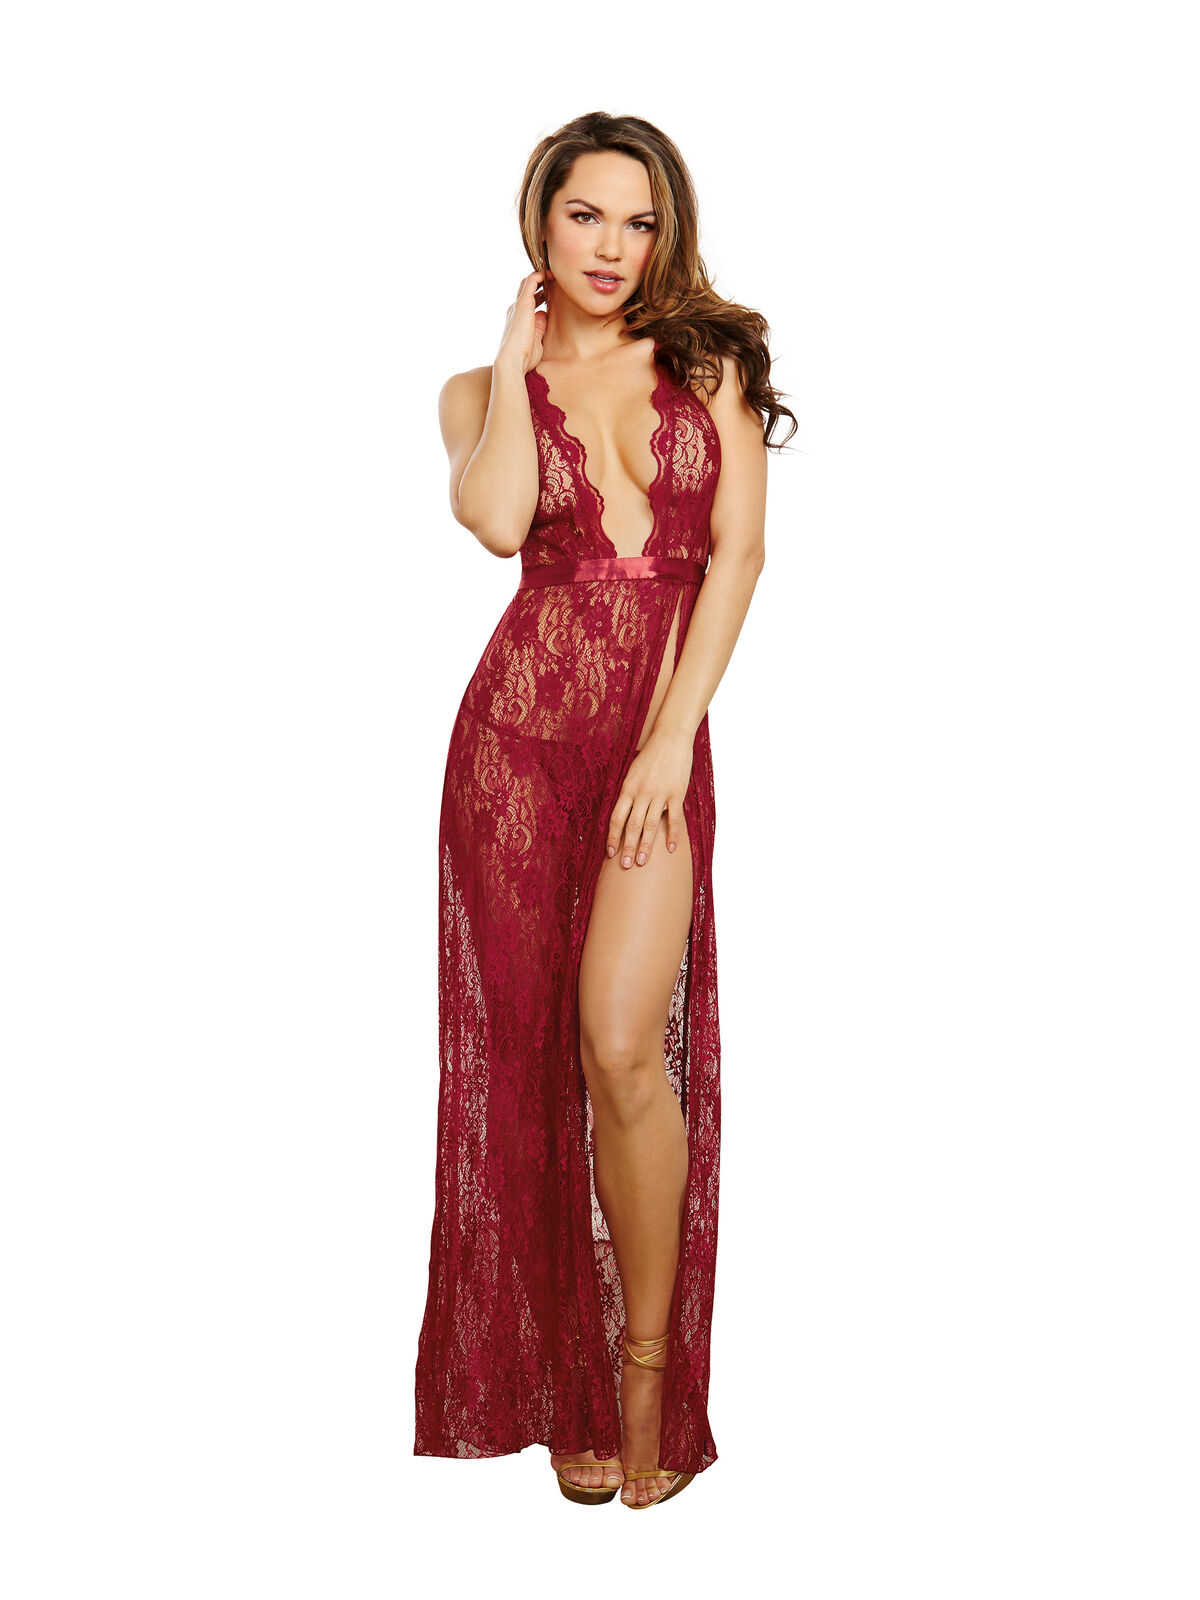 Dreamgirl Garnet Red Lace Womens Long Gown & G-String Set Sexy Ladies Nightwear